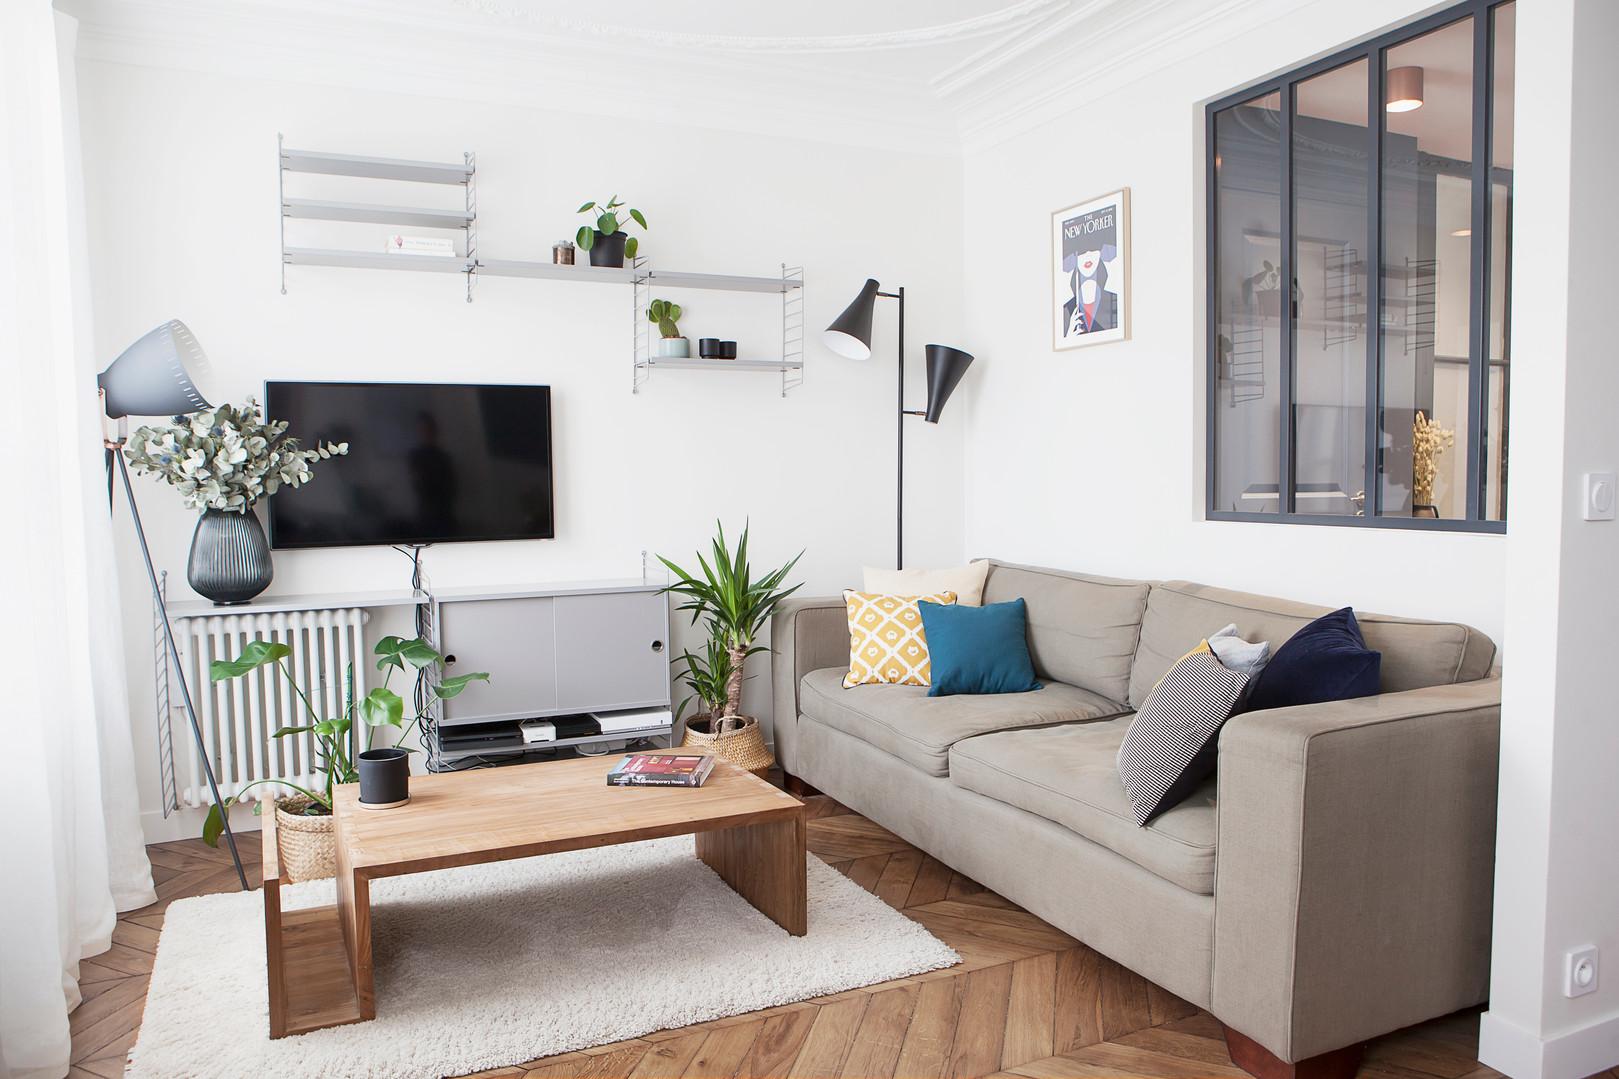 Appartement Saussier Leroy